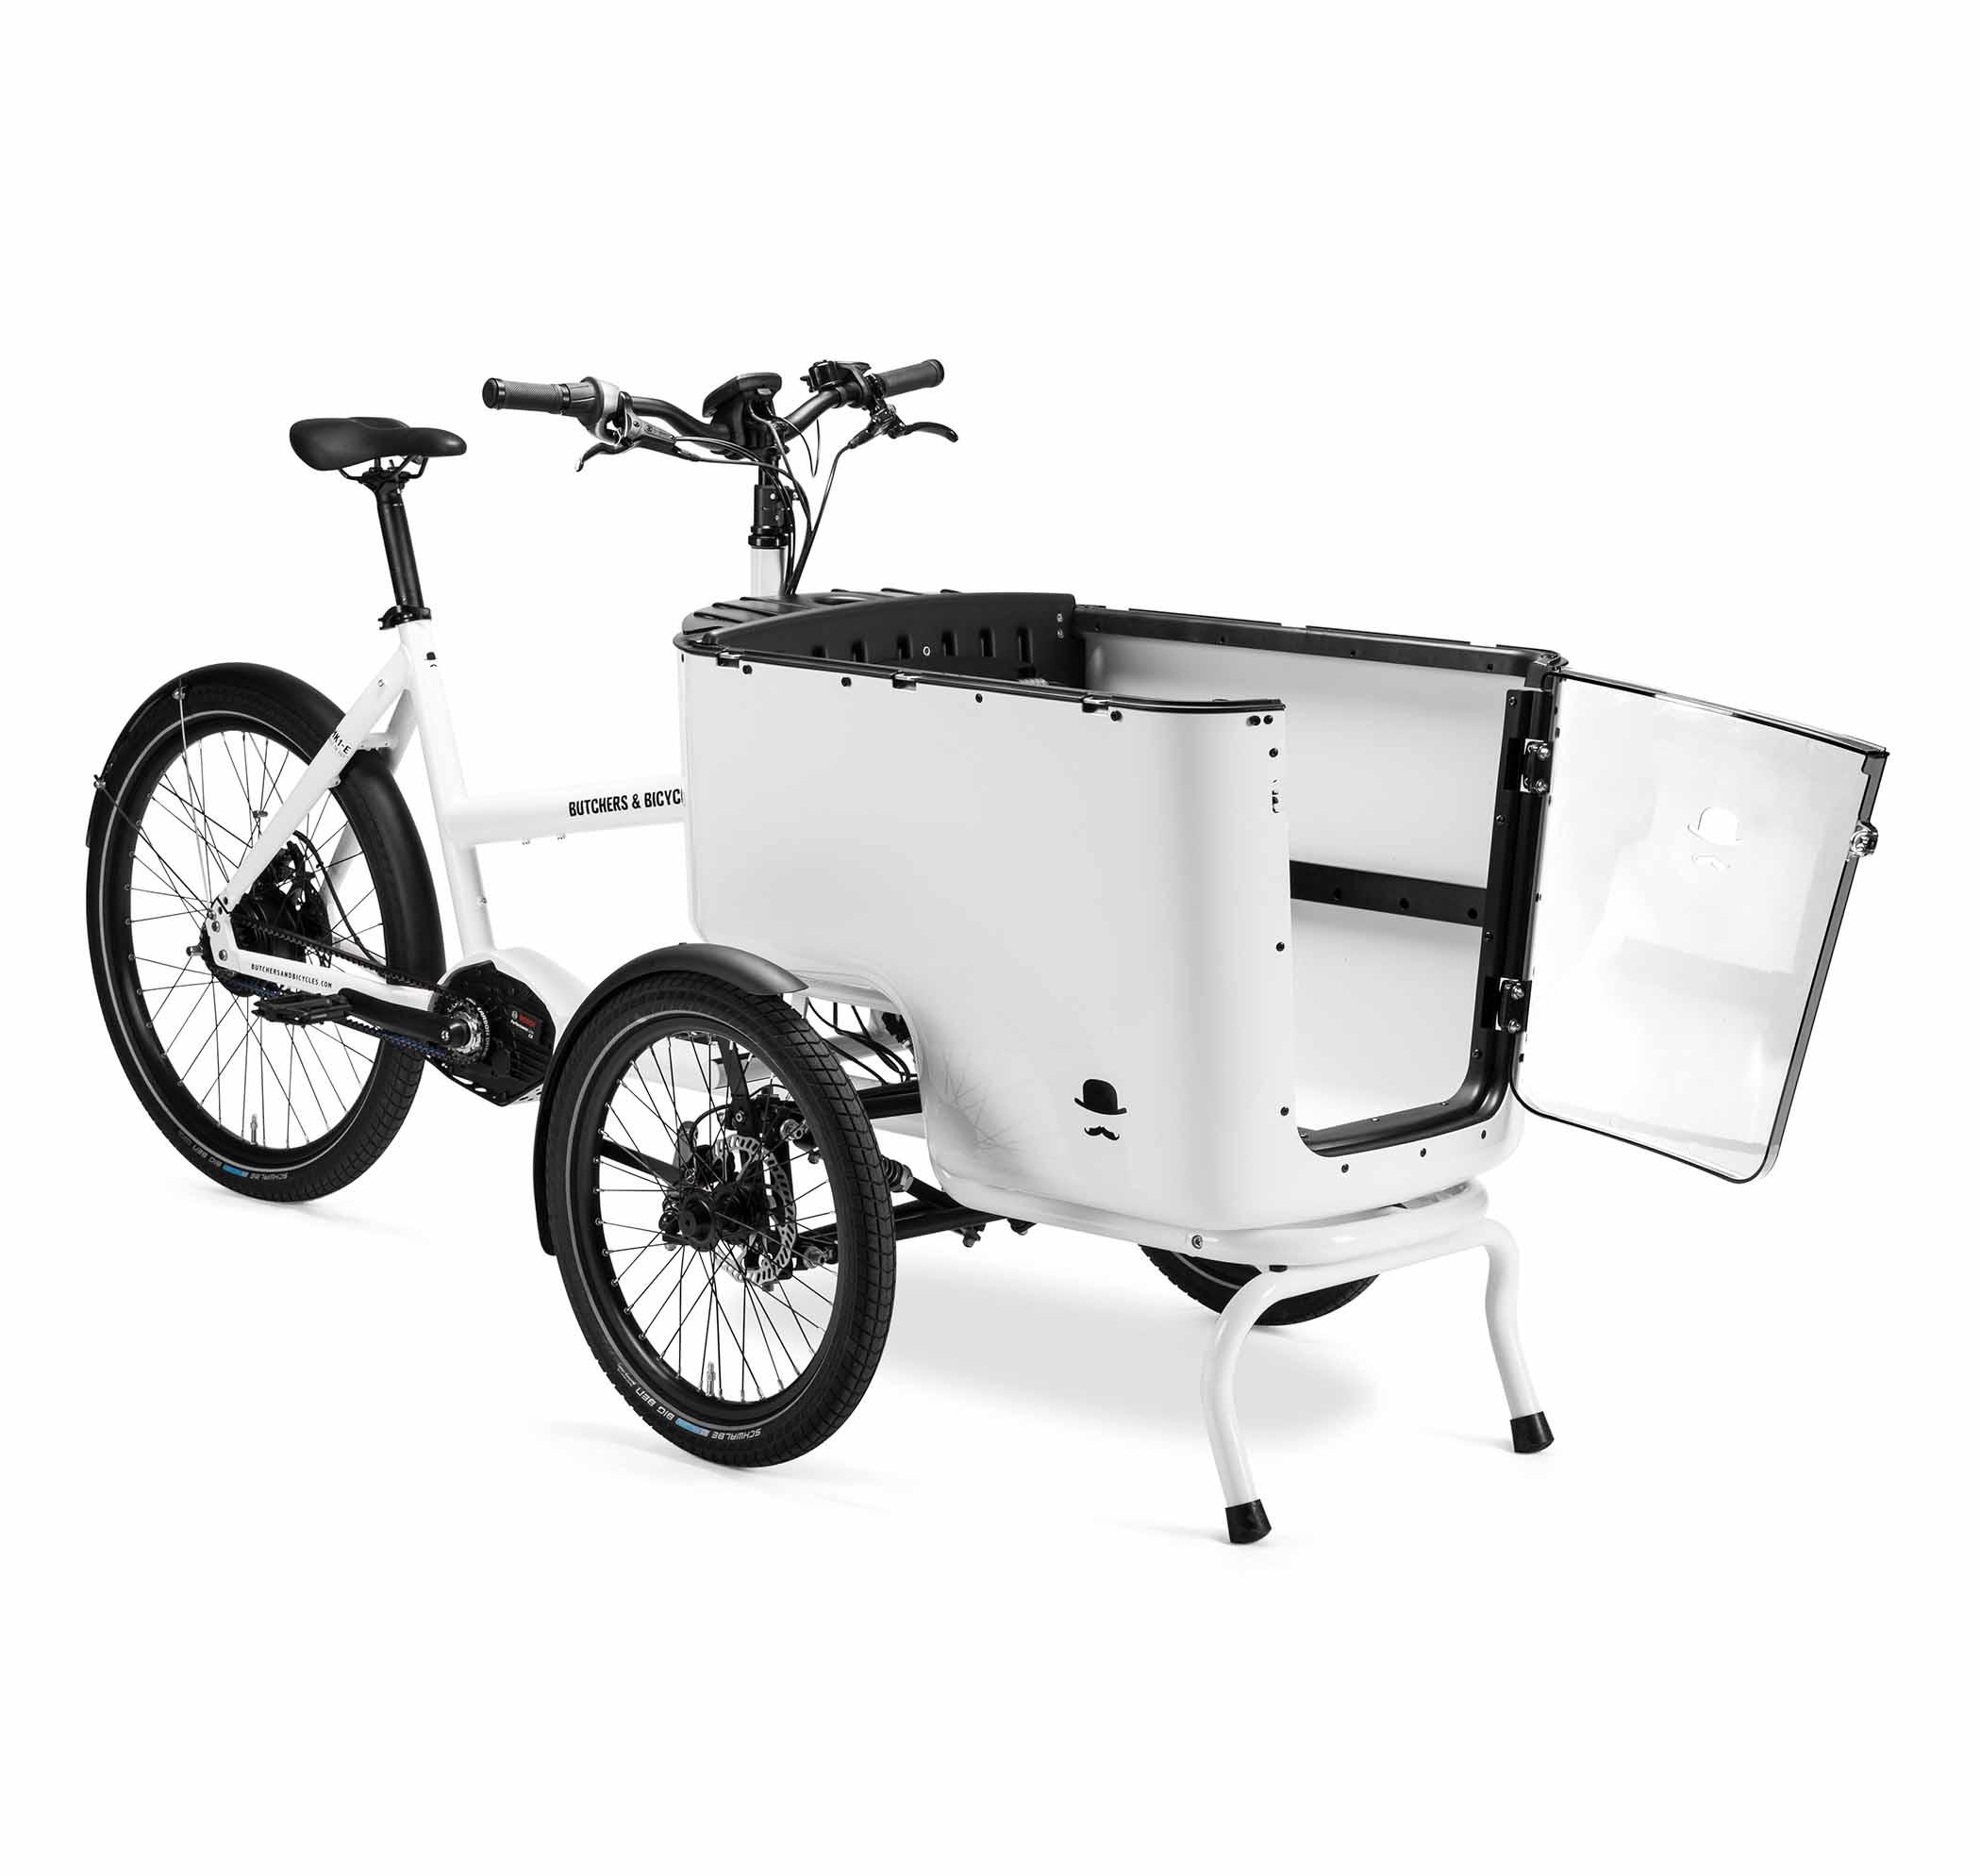 Butchers_Bicycles_Rodeo_Bike_Mk1_E_Vario_White